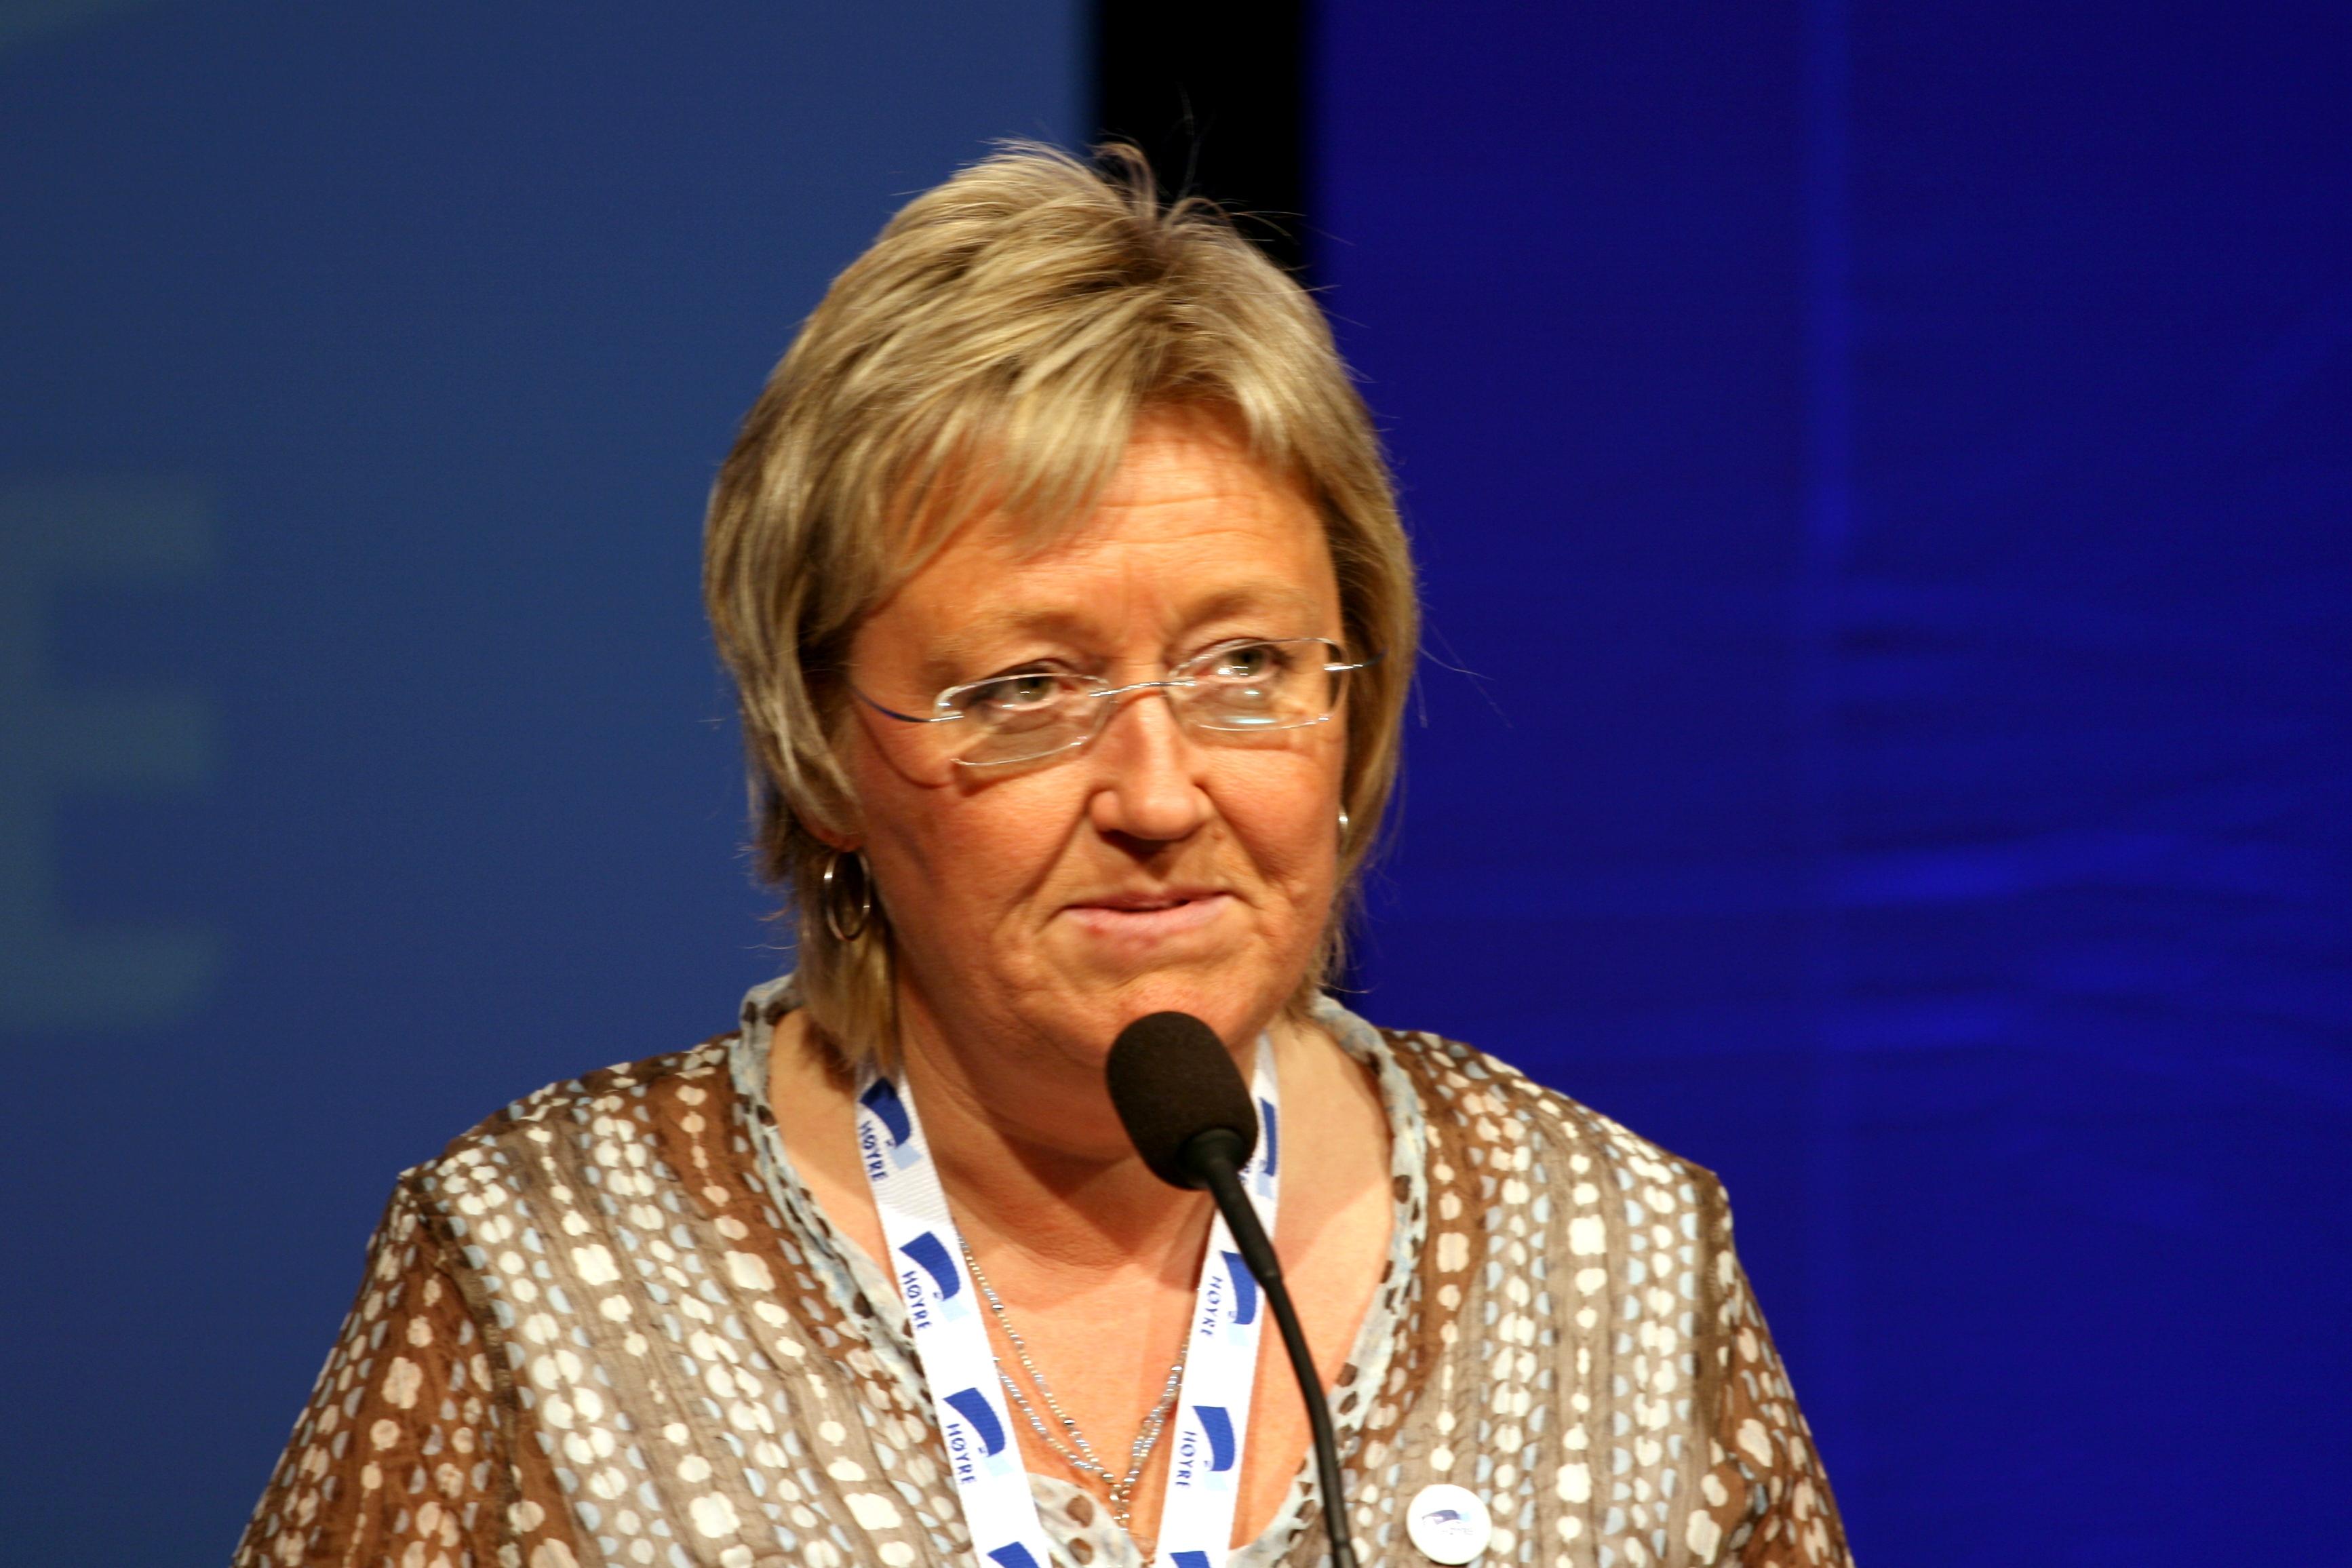 Elisabeth Aspaker Wikipedia